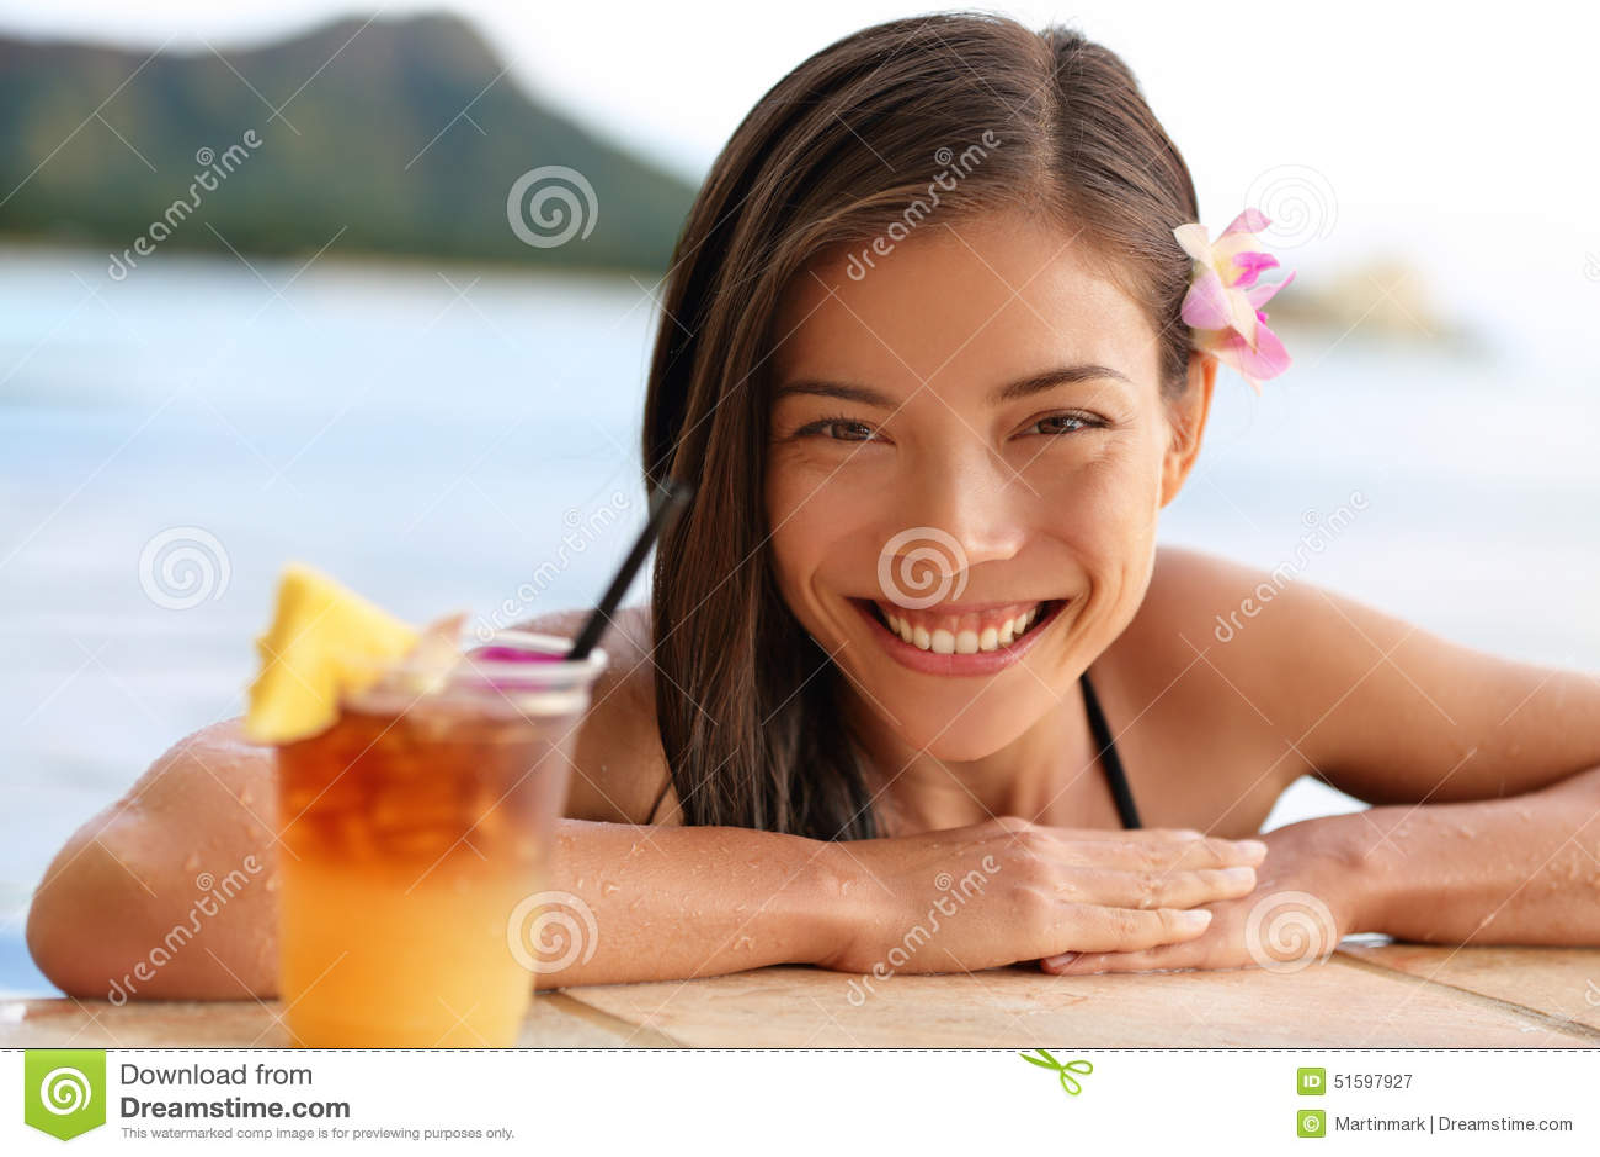 Hawaii woman with hawaiian mai tai drink on beach stock photo image 51597927 for Swimming pools drank instrumental